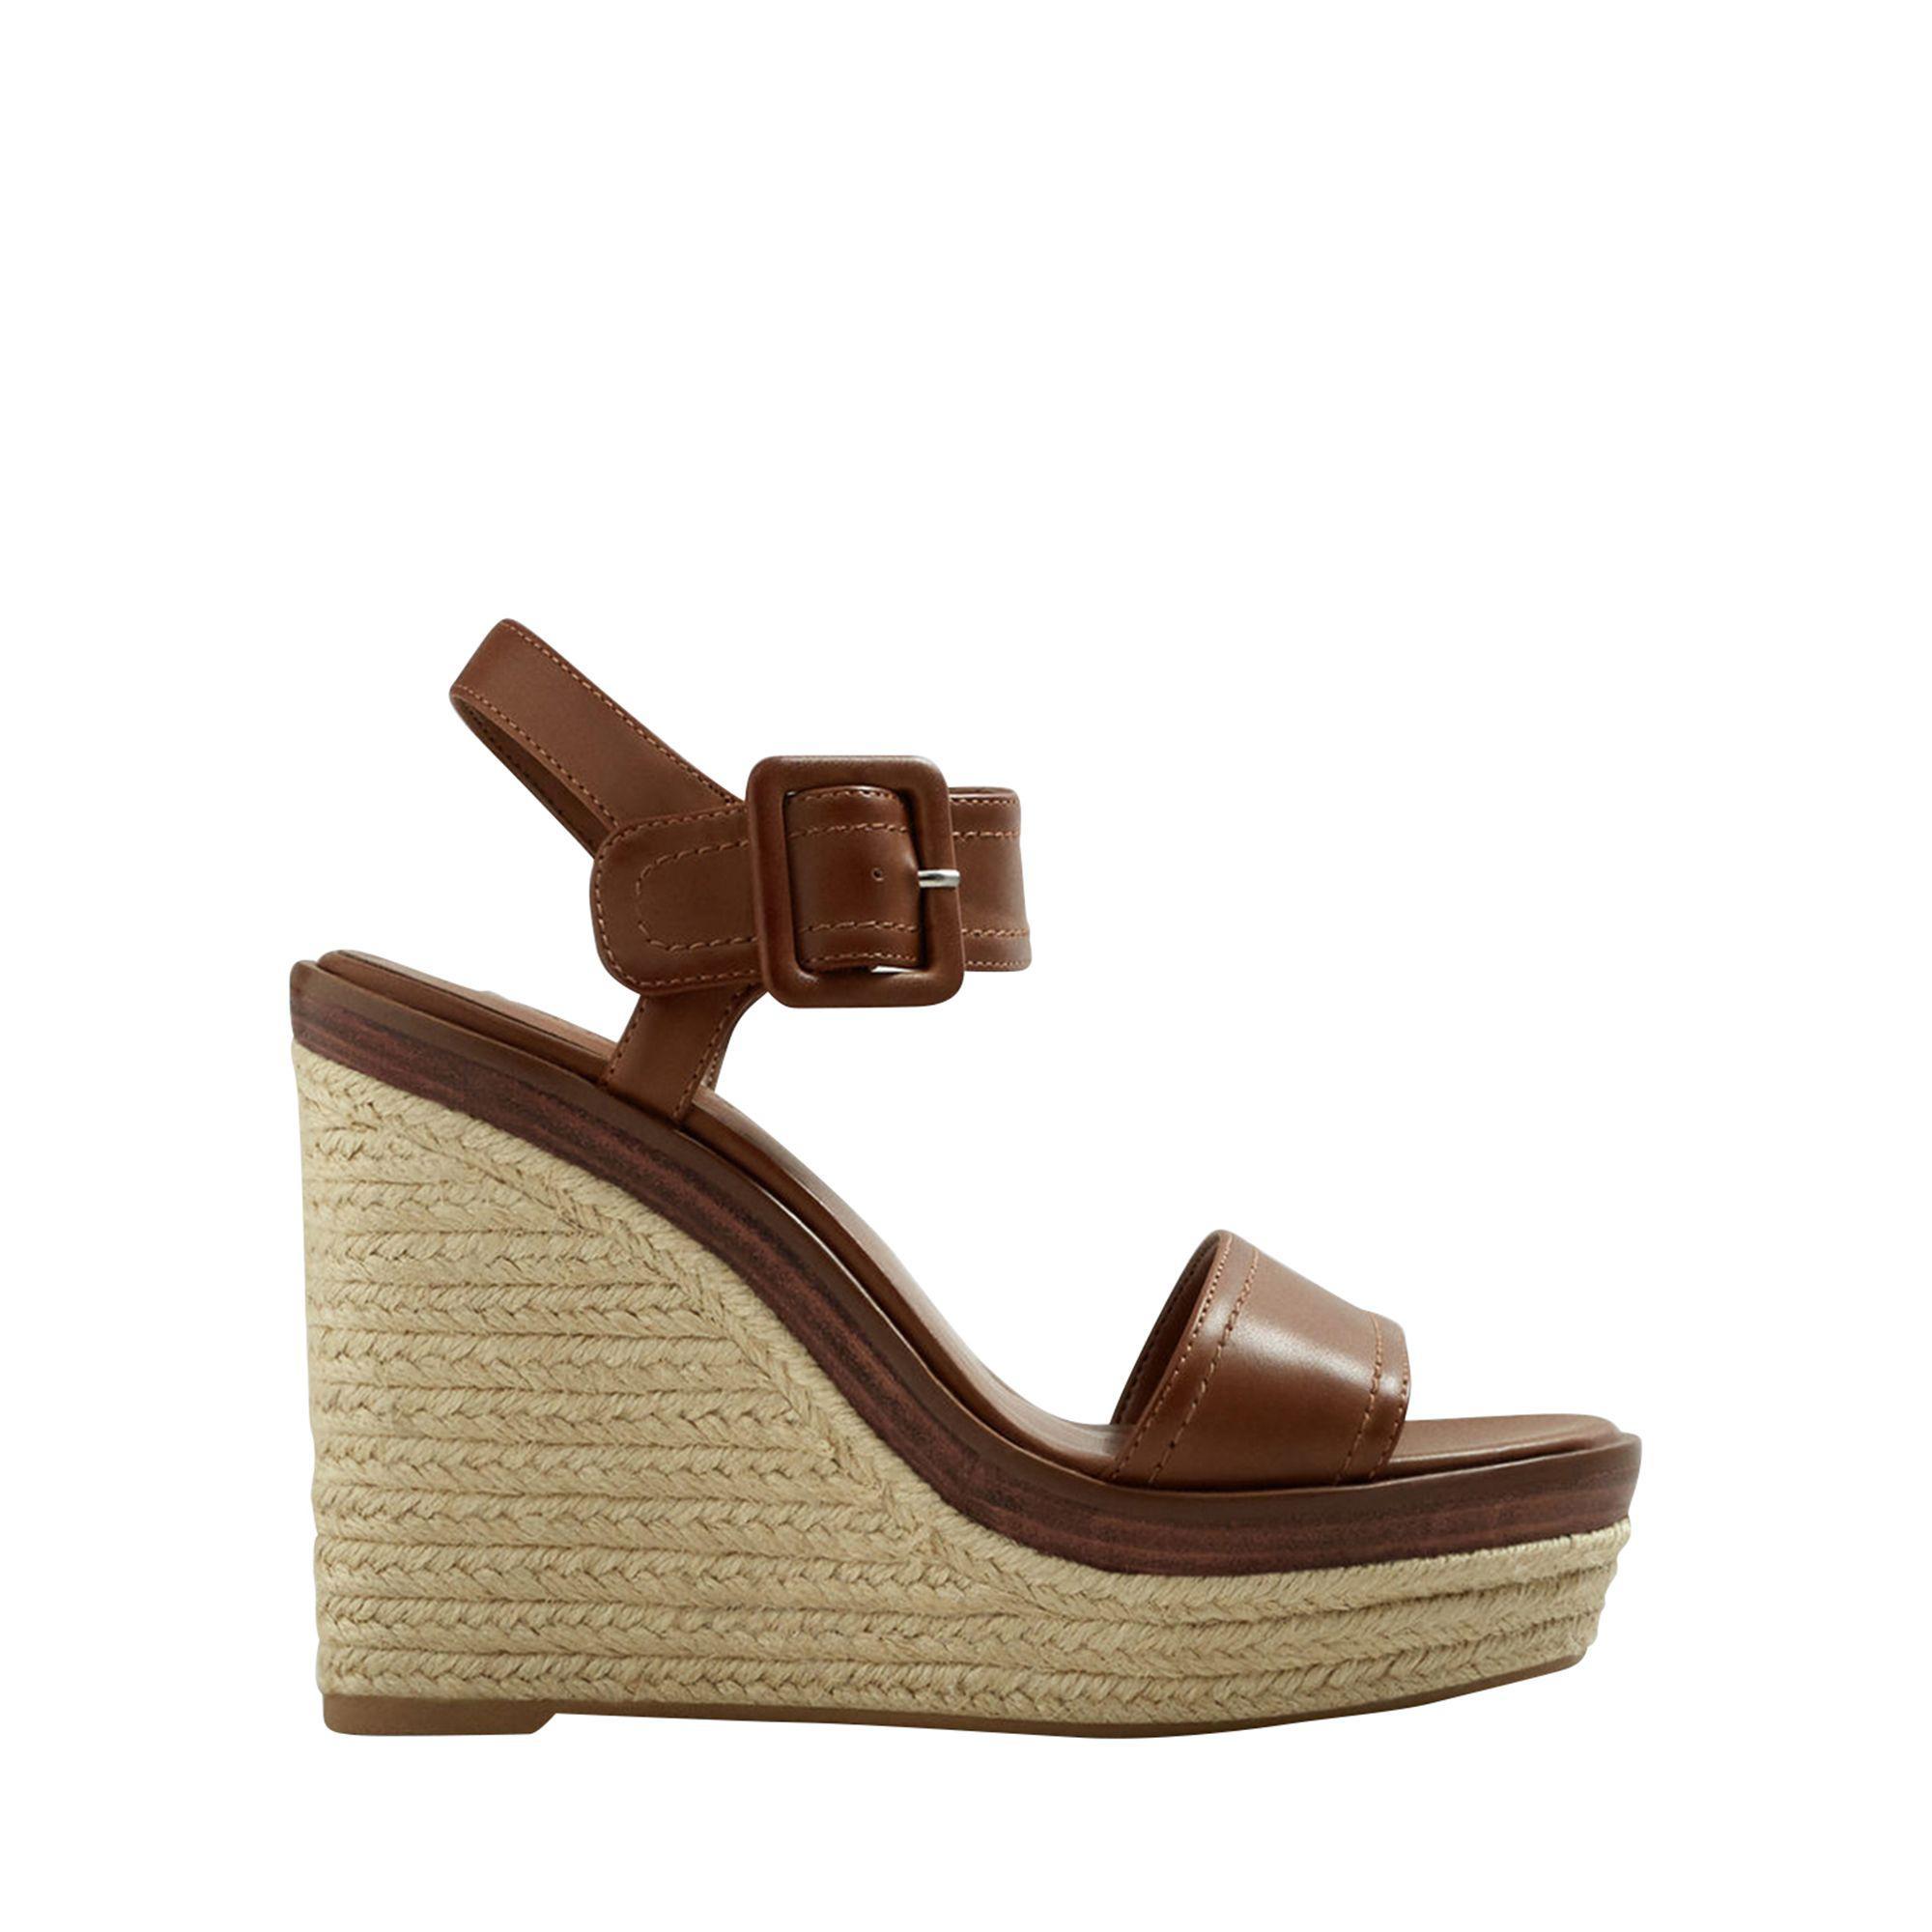 82cabdb35e2 Mango Tan  gome  High Wedge Heel Sandals in Brown - Lyst